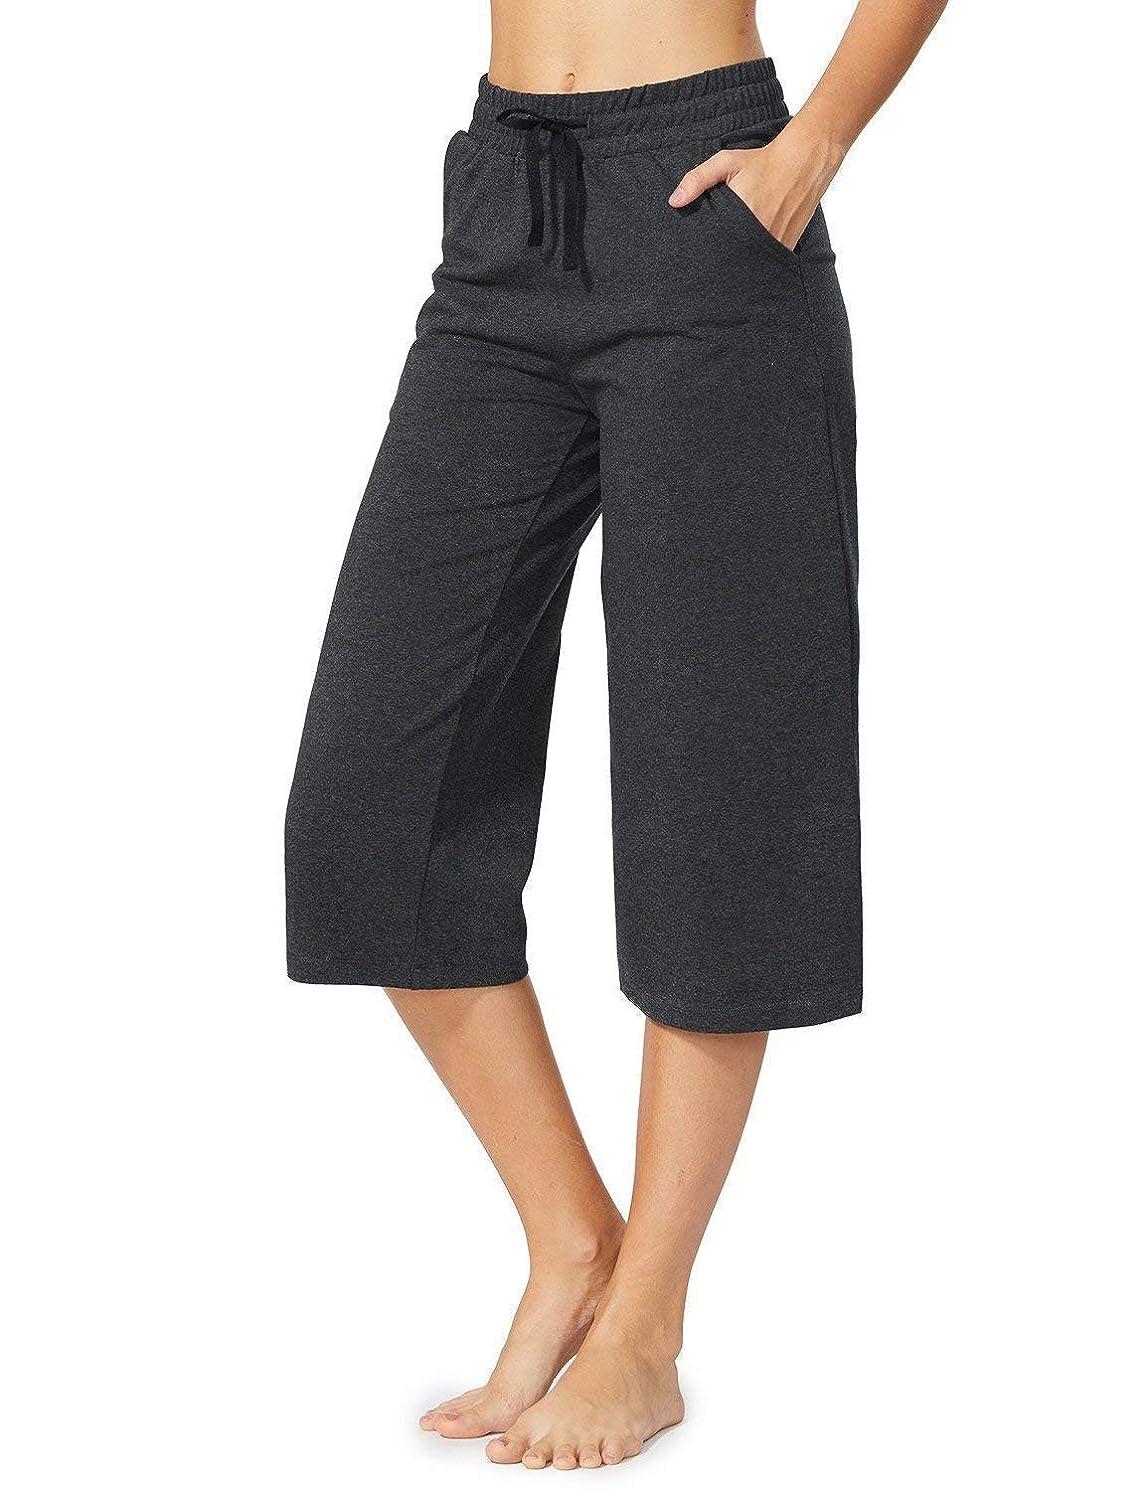 MYIFU Women's Active Yoga Lounge Capri Pants